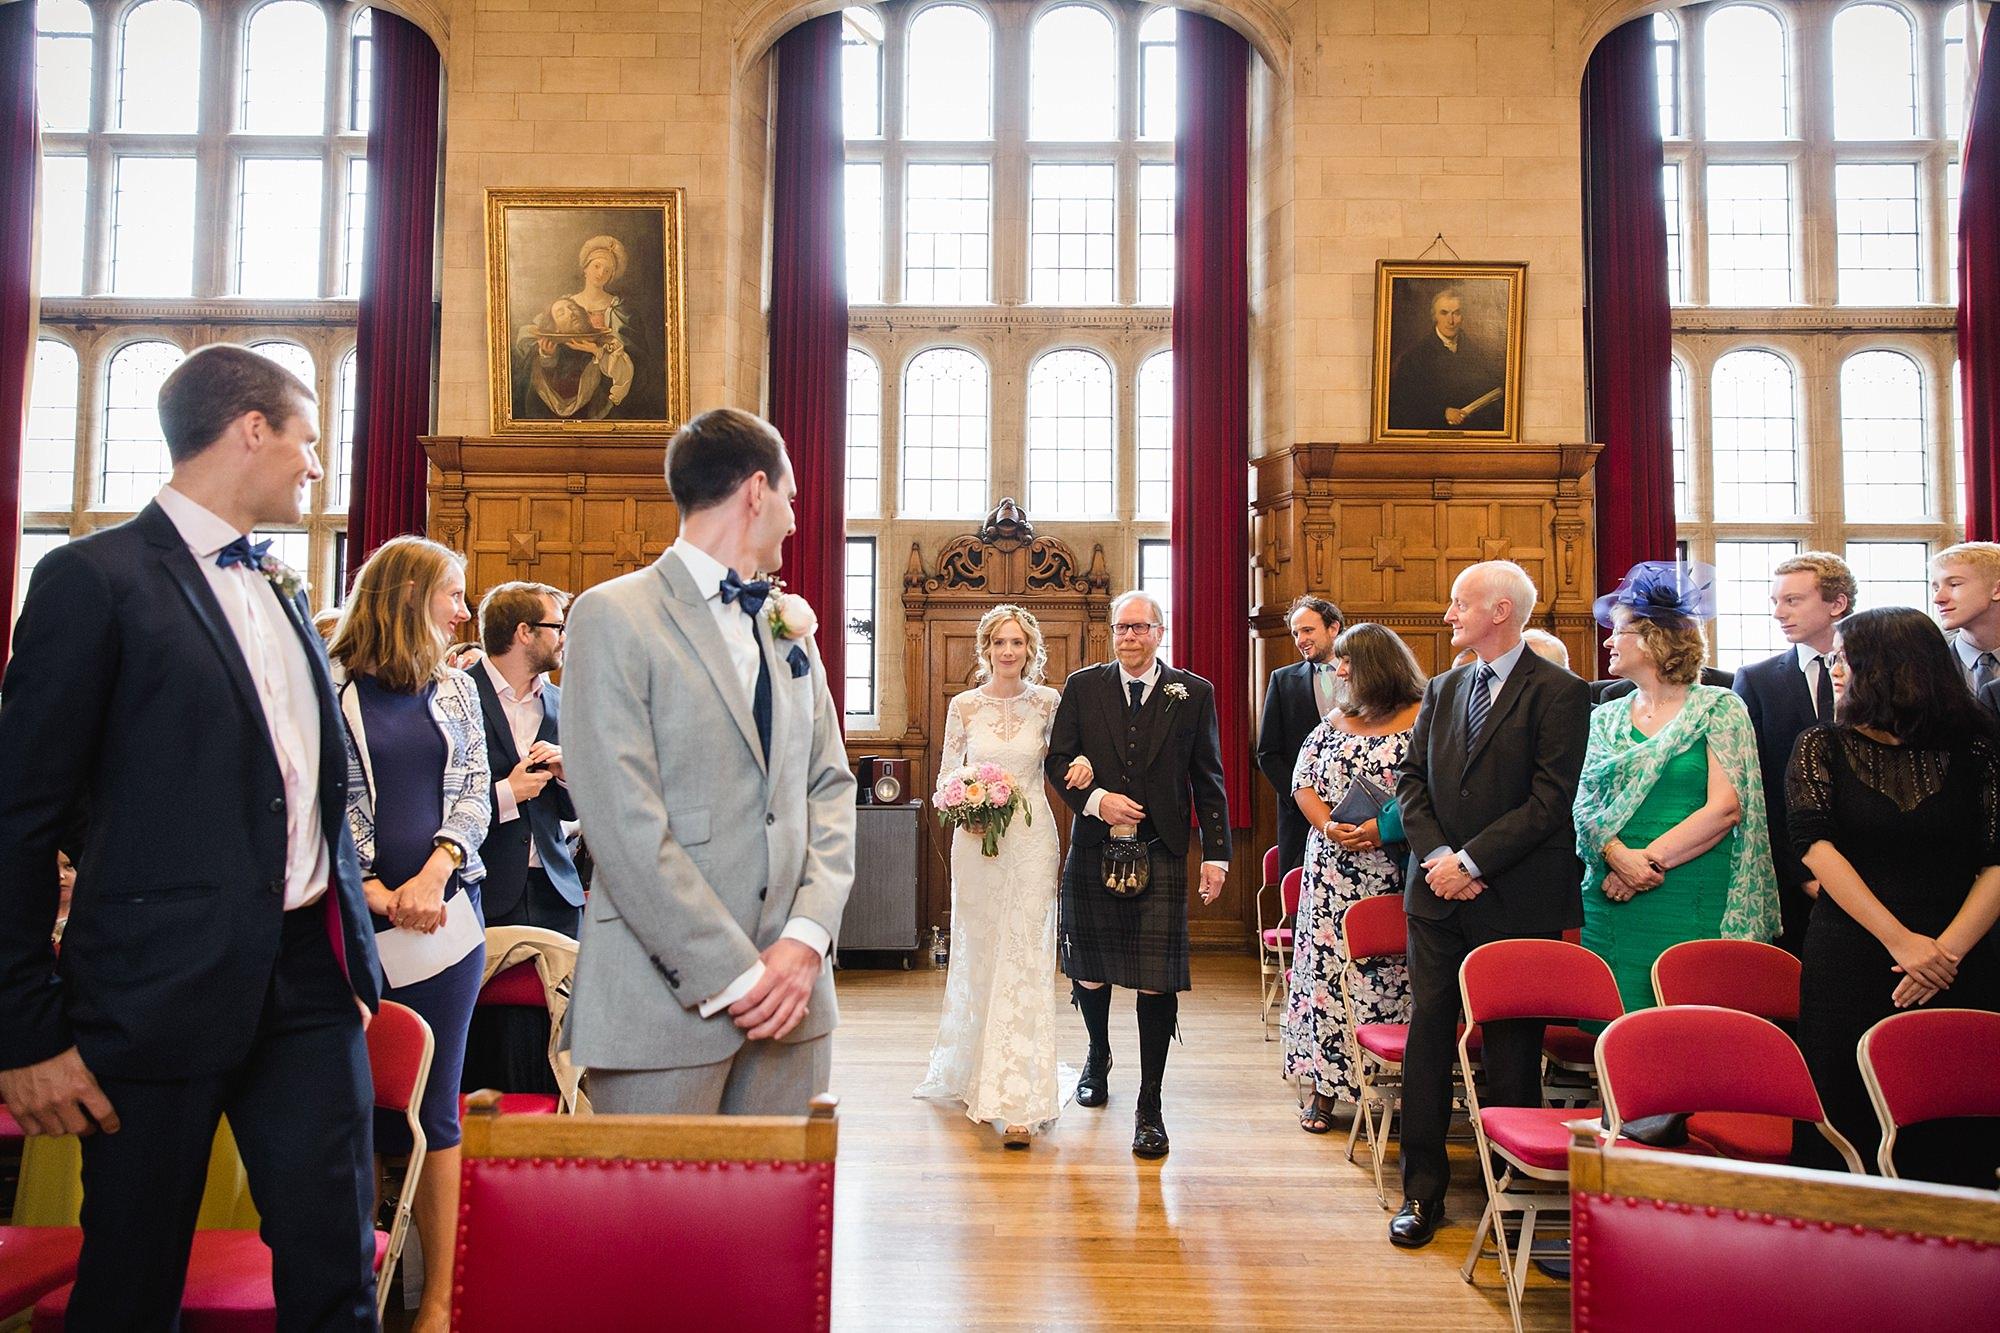 Isis Farmhouse Oxford Wedding portrait of bride walking down the aisle at oxford town hal